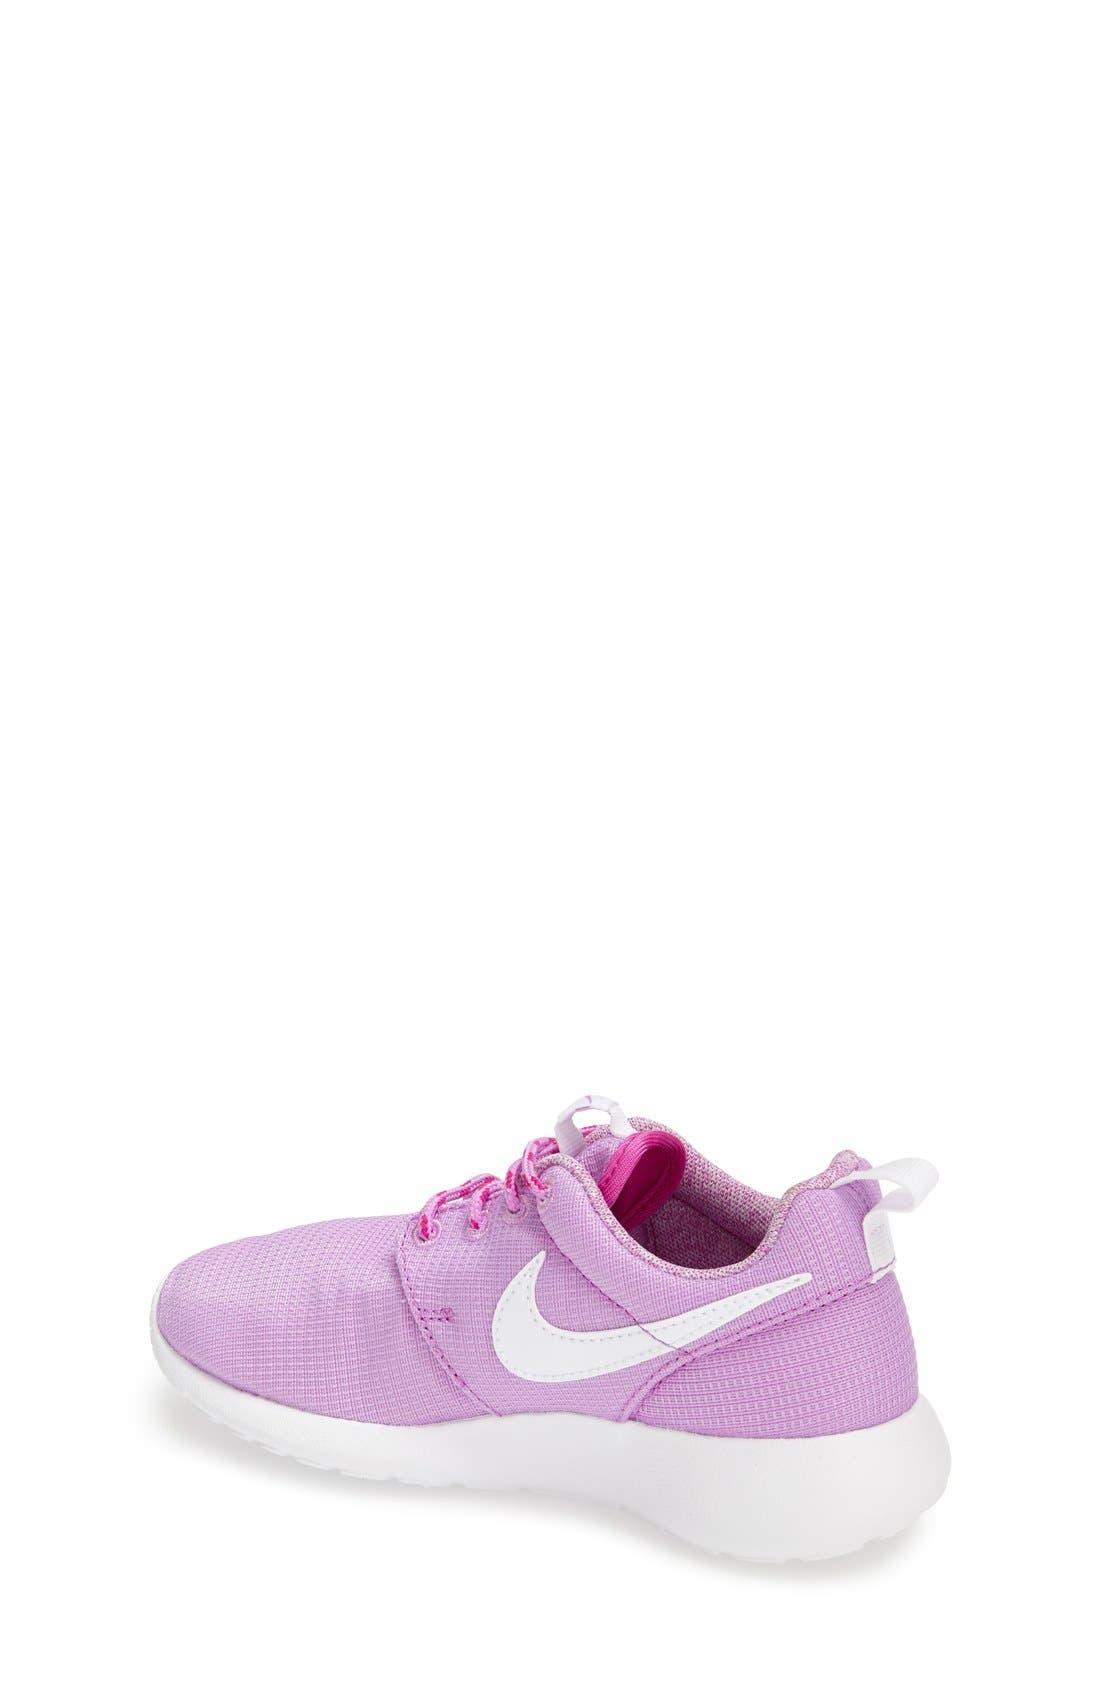 'Roshe Run' Athletic Shoe,                             Alternate thumbnail 98, color,